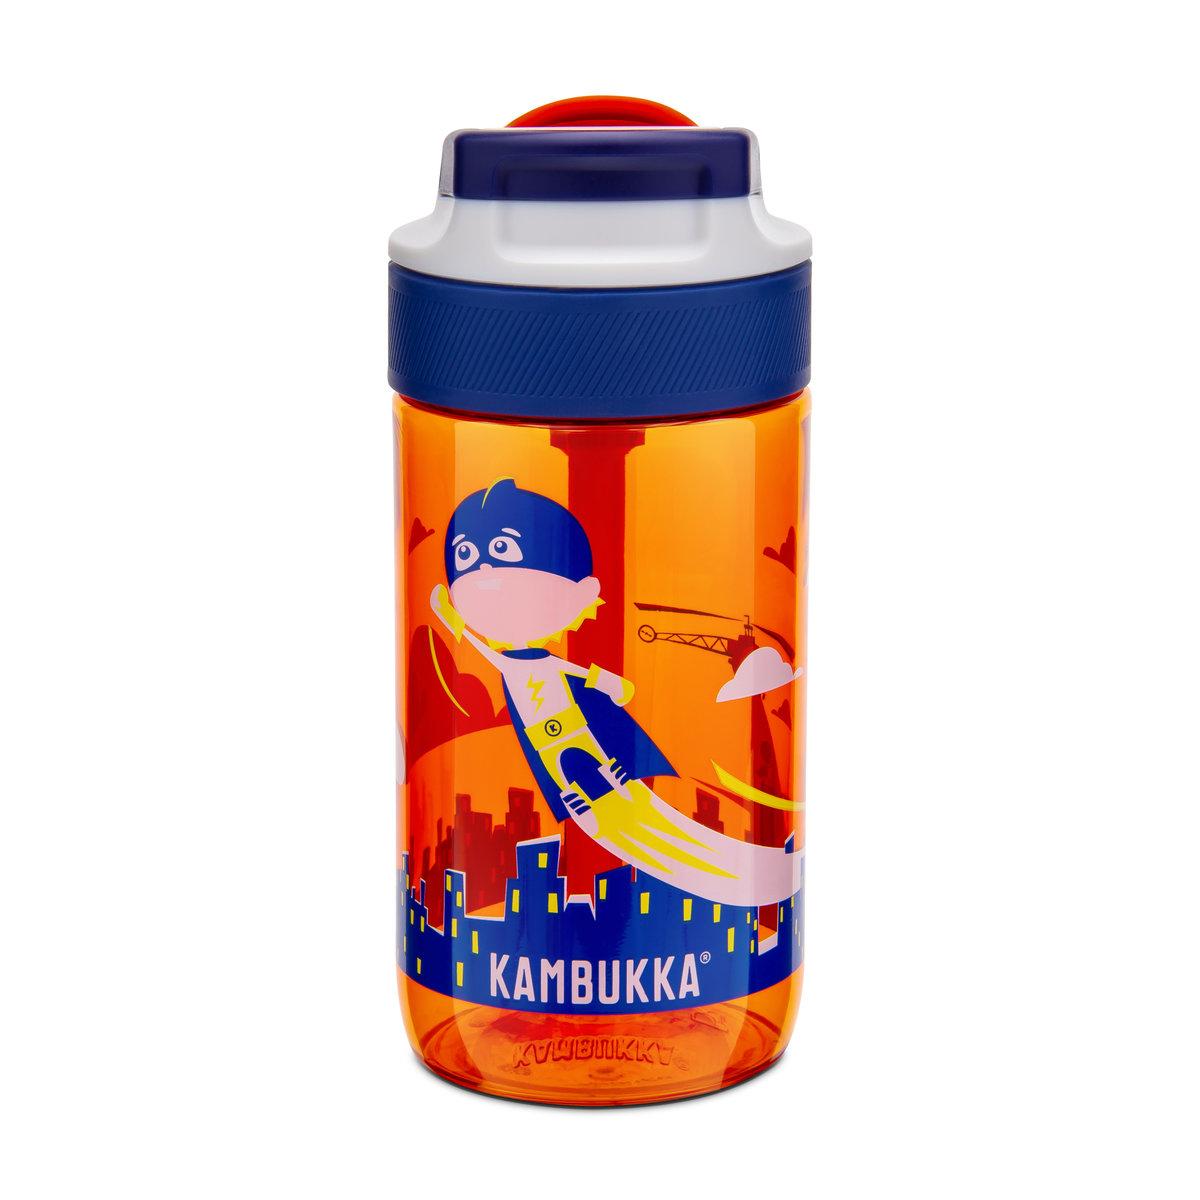 Kambukka 藍湖兒童吸管杯 (Tritan) 14oz (400ml) – 橙色+男孩小超人圖案